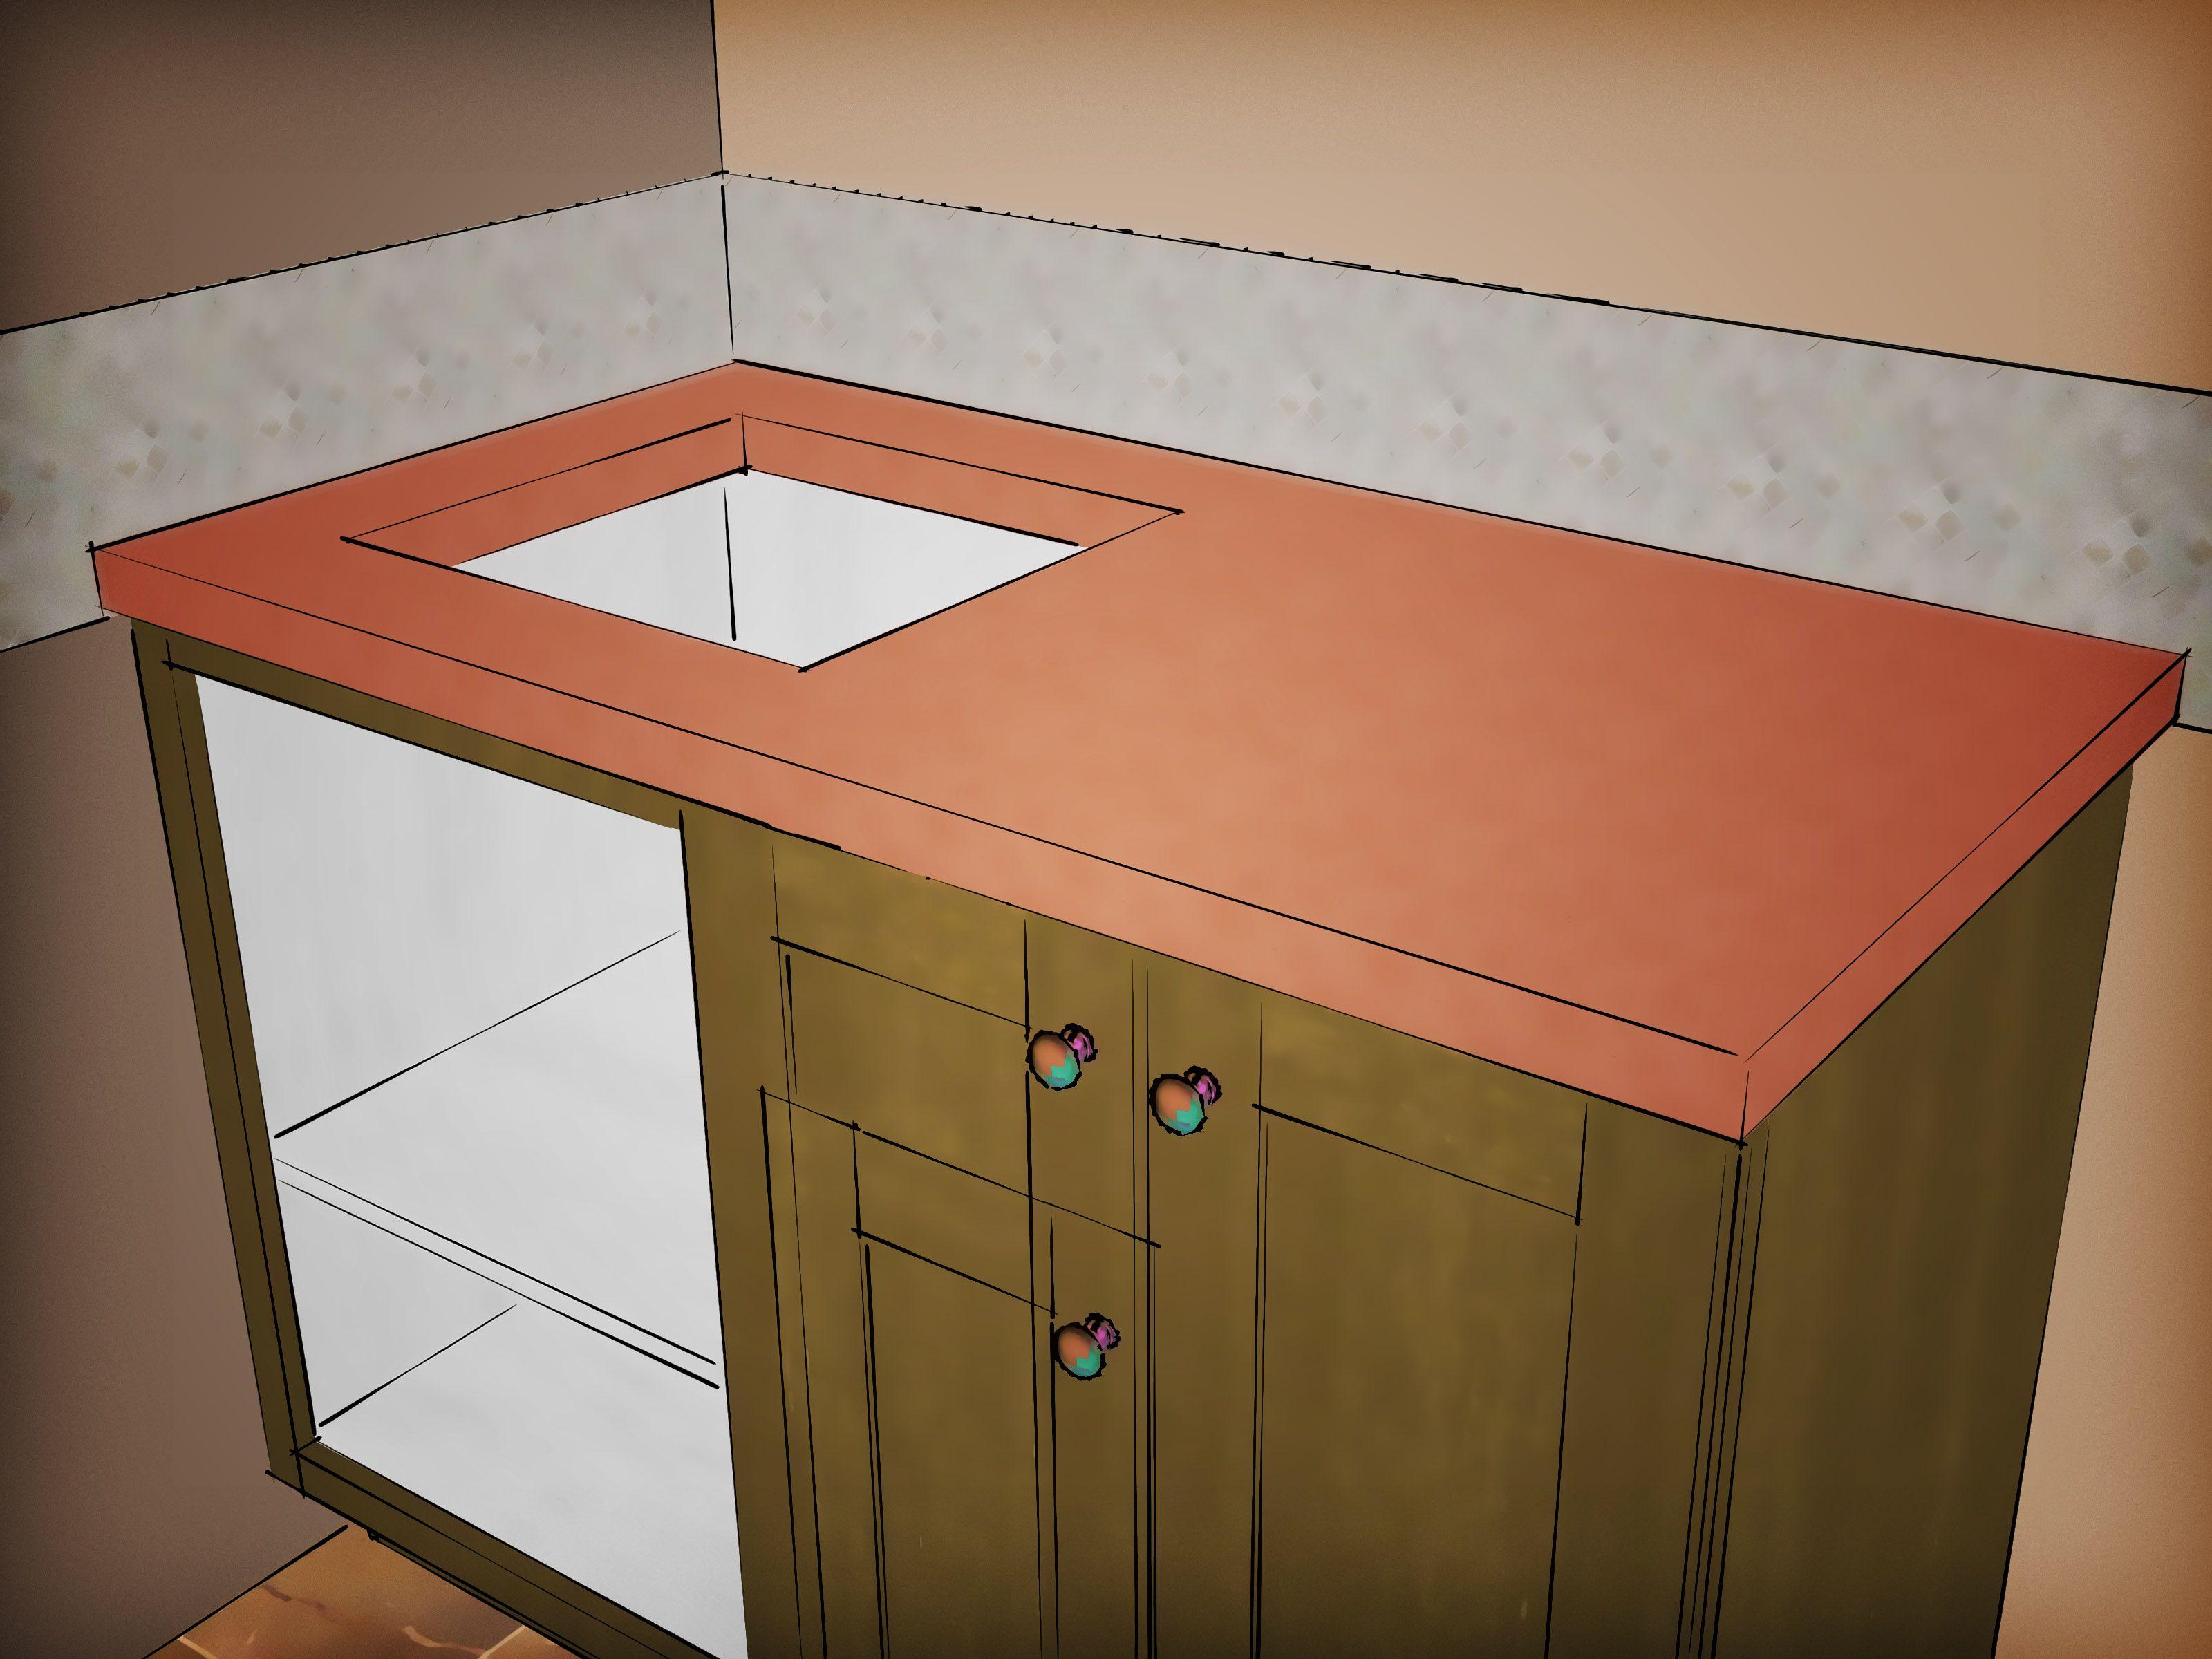 Make Concrete Countertops | Countertop, Concrete and Countertops